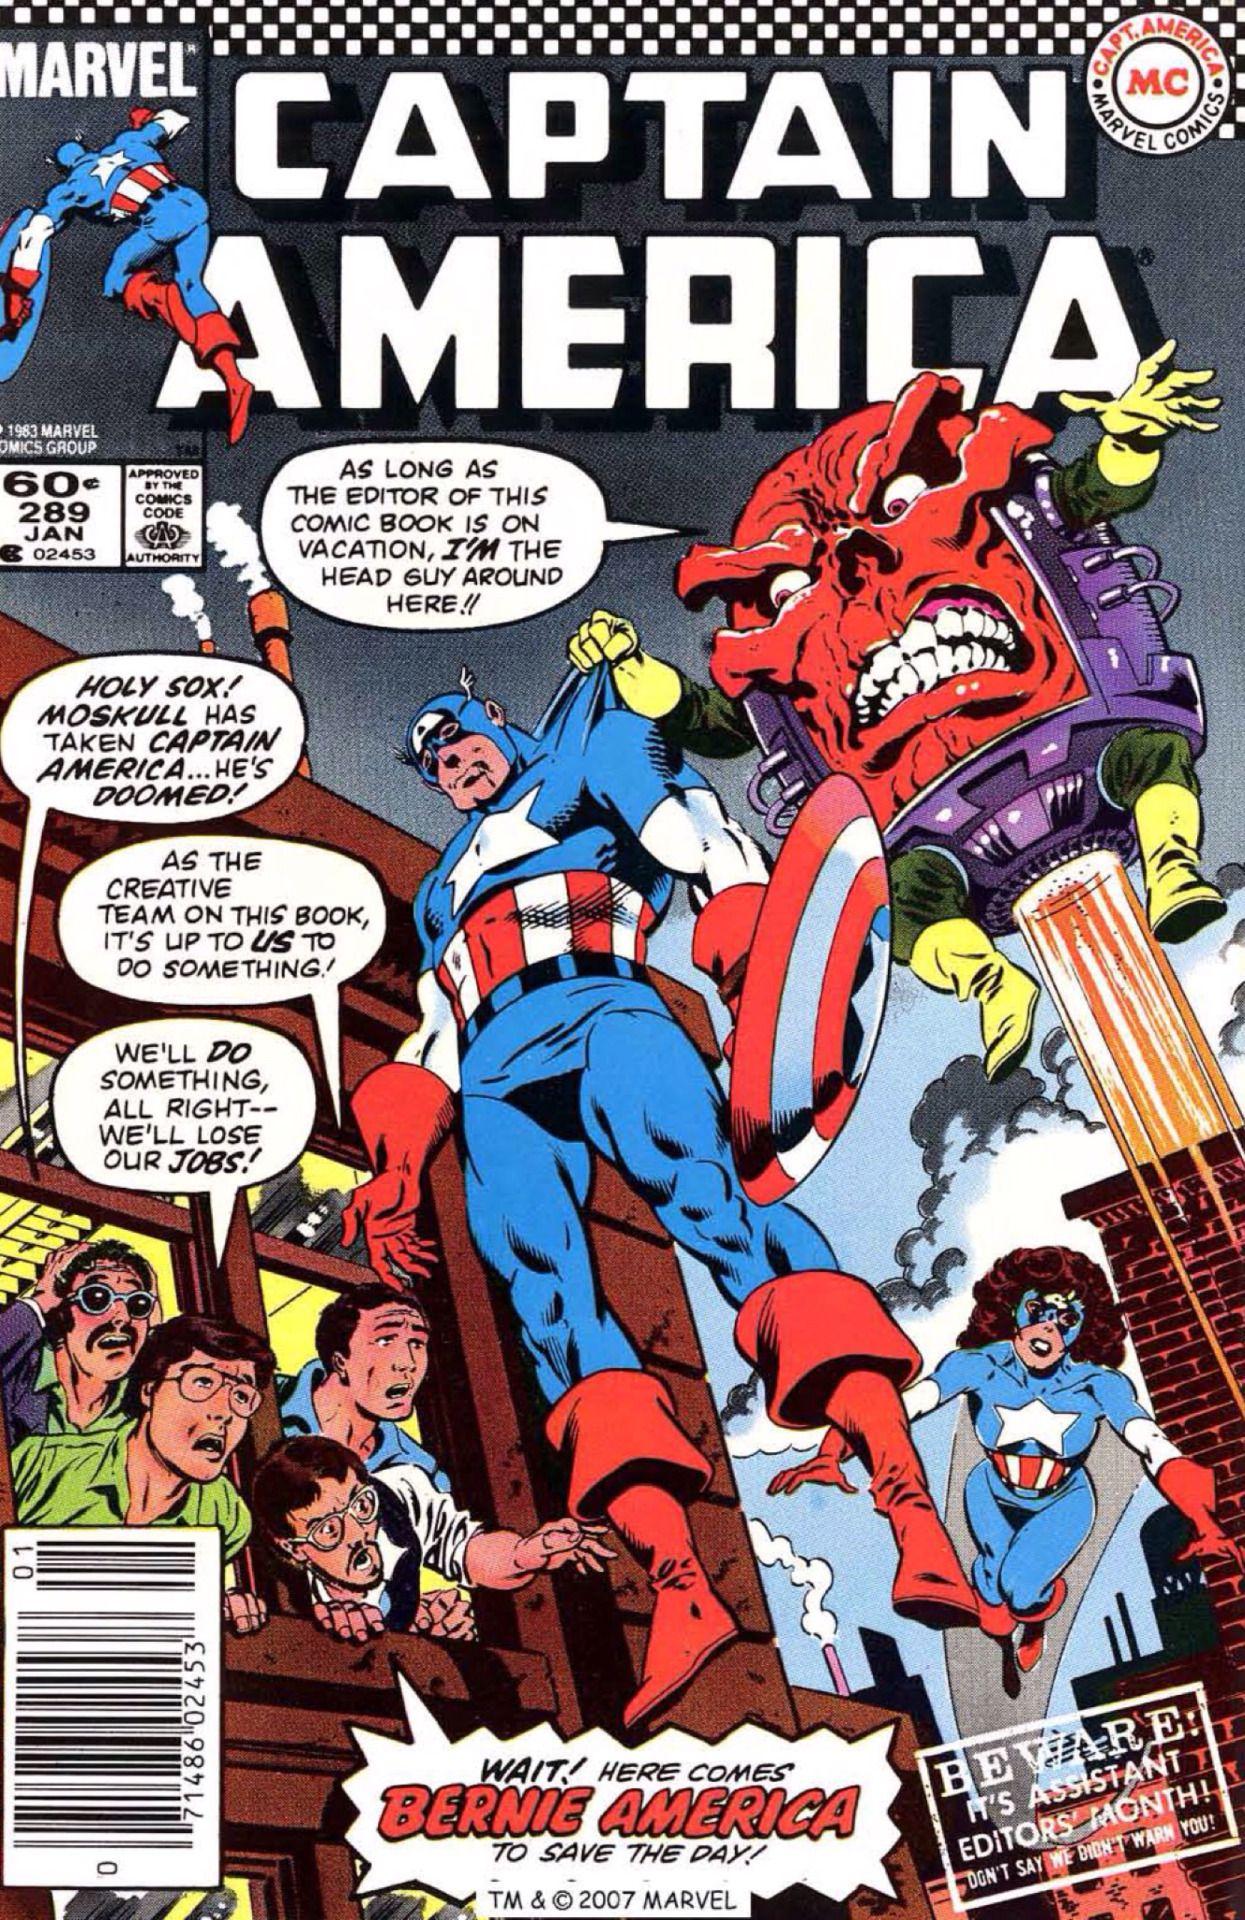 marvel1980s | Marvel comics vintage, Captain america comic books, Captain  america comic